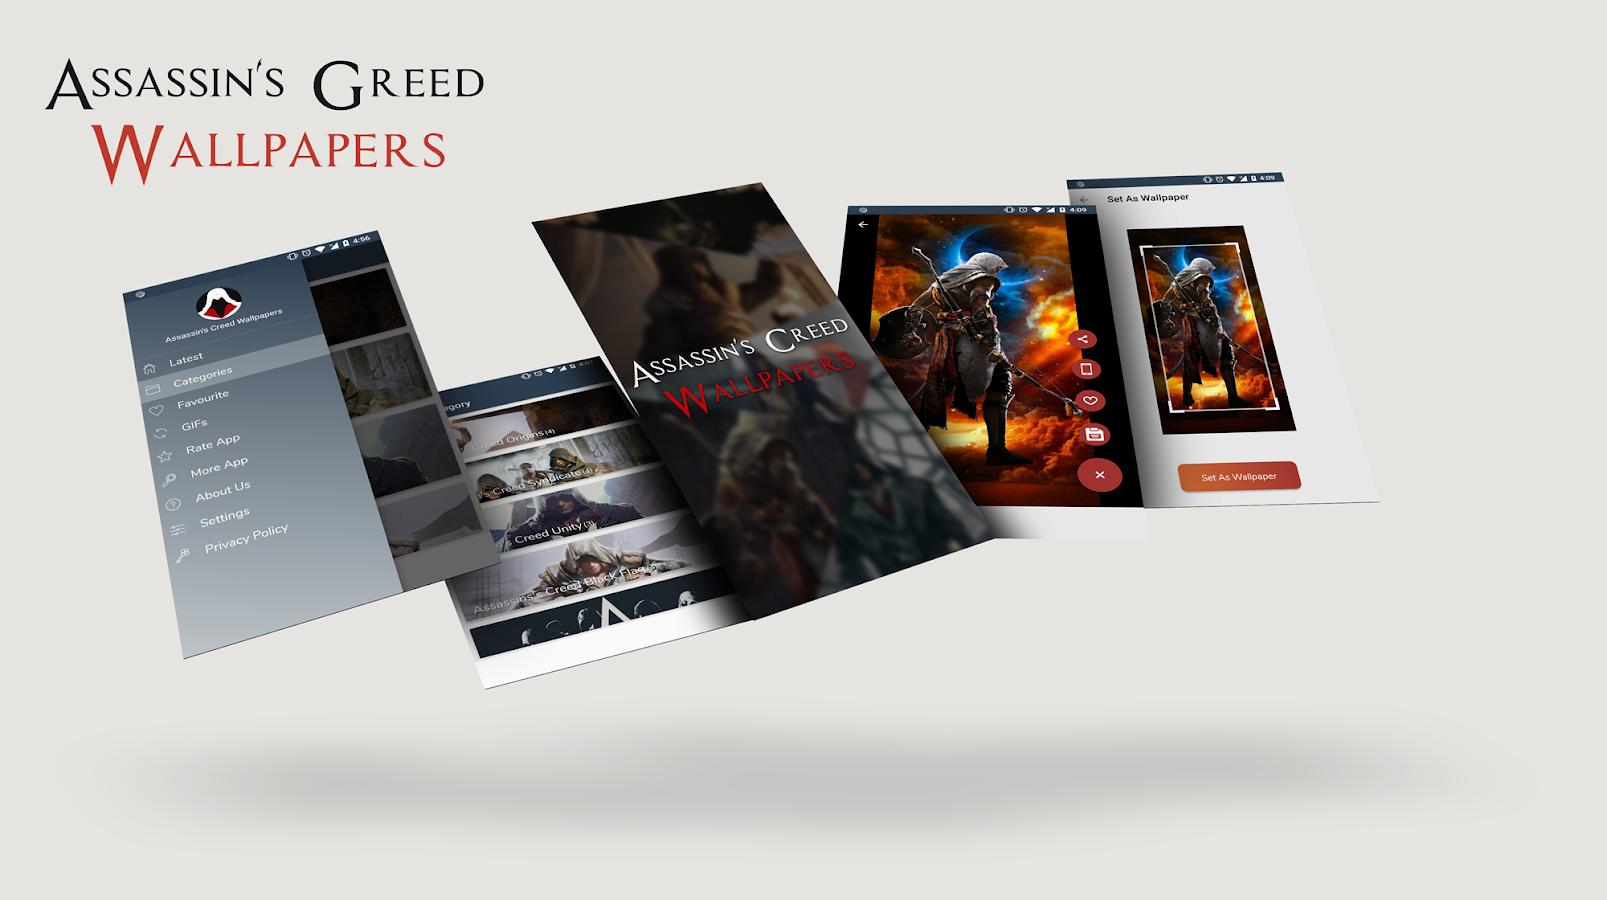 assassins creed unity download apk